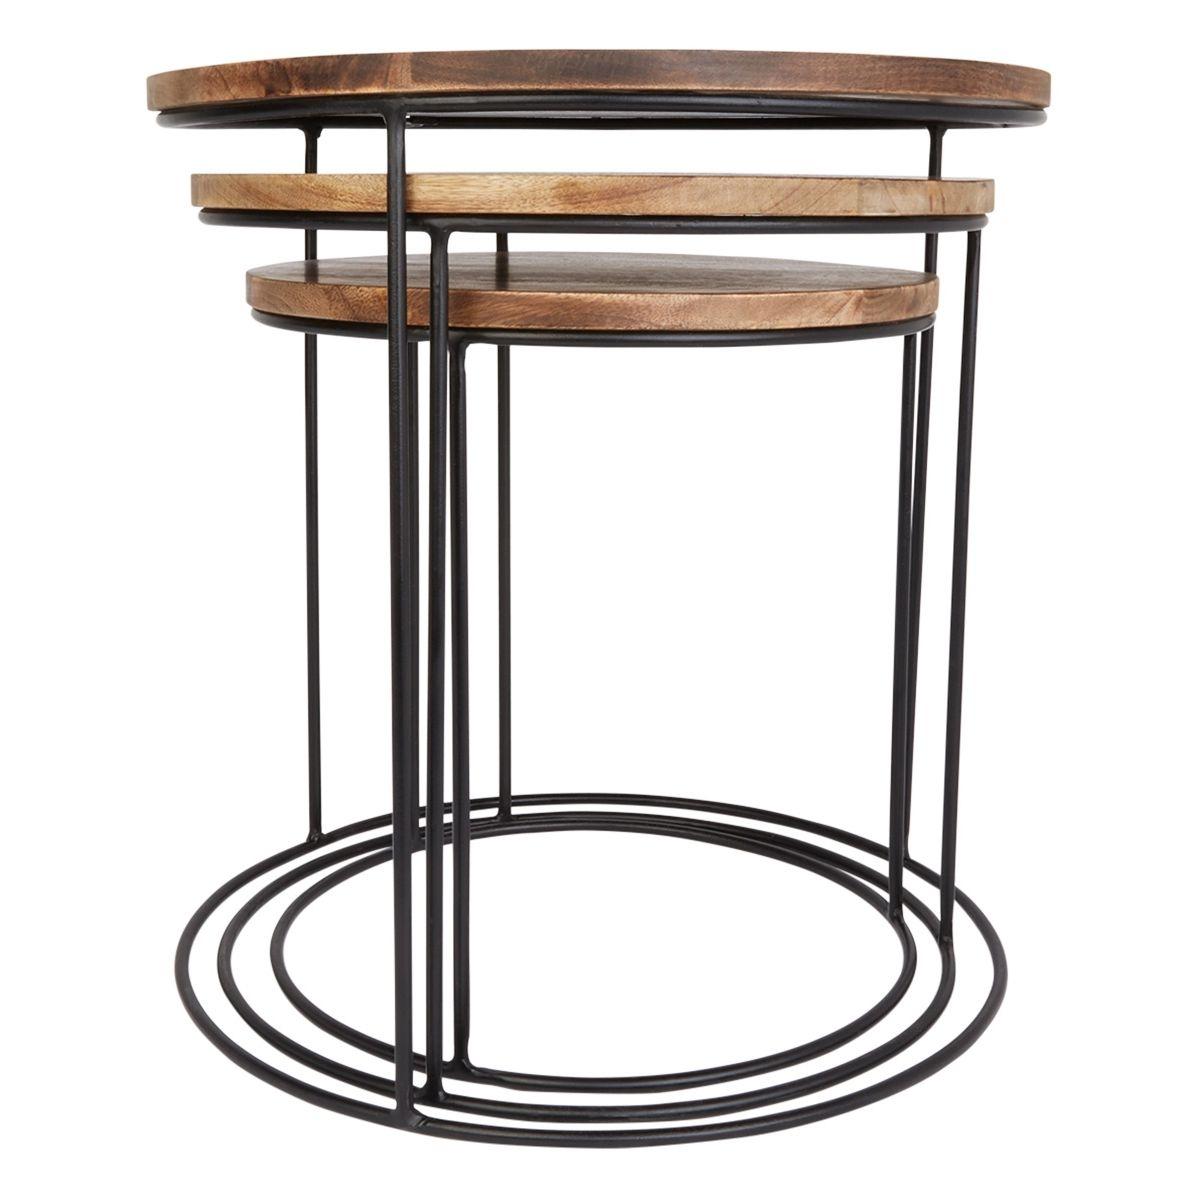 3 Tables Basses Gigogne Omango Bois Et Métal